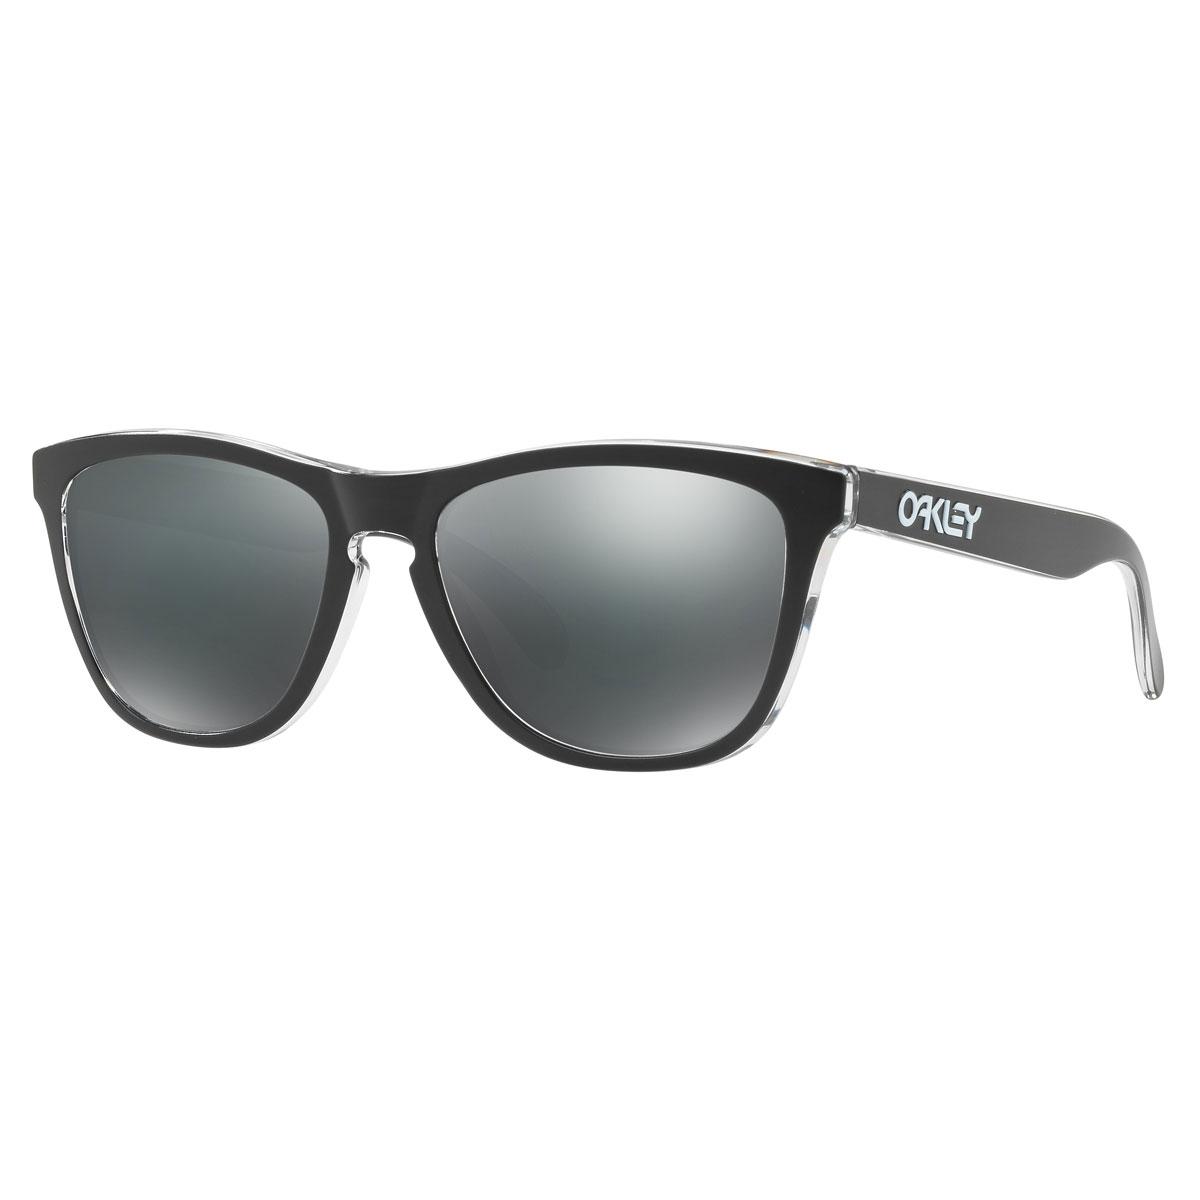 Oakley Frogskins Men\'s Sunglasses - Eclipse Clear Frames/Black ...